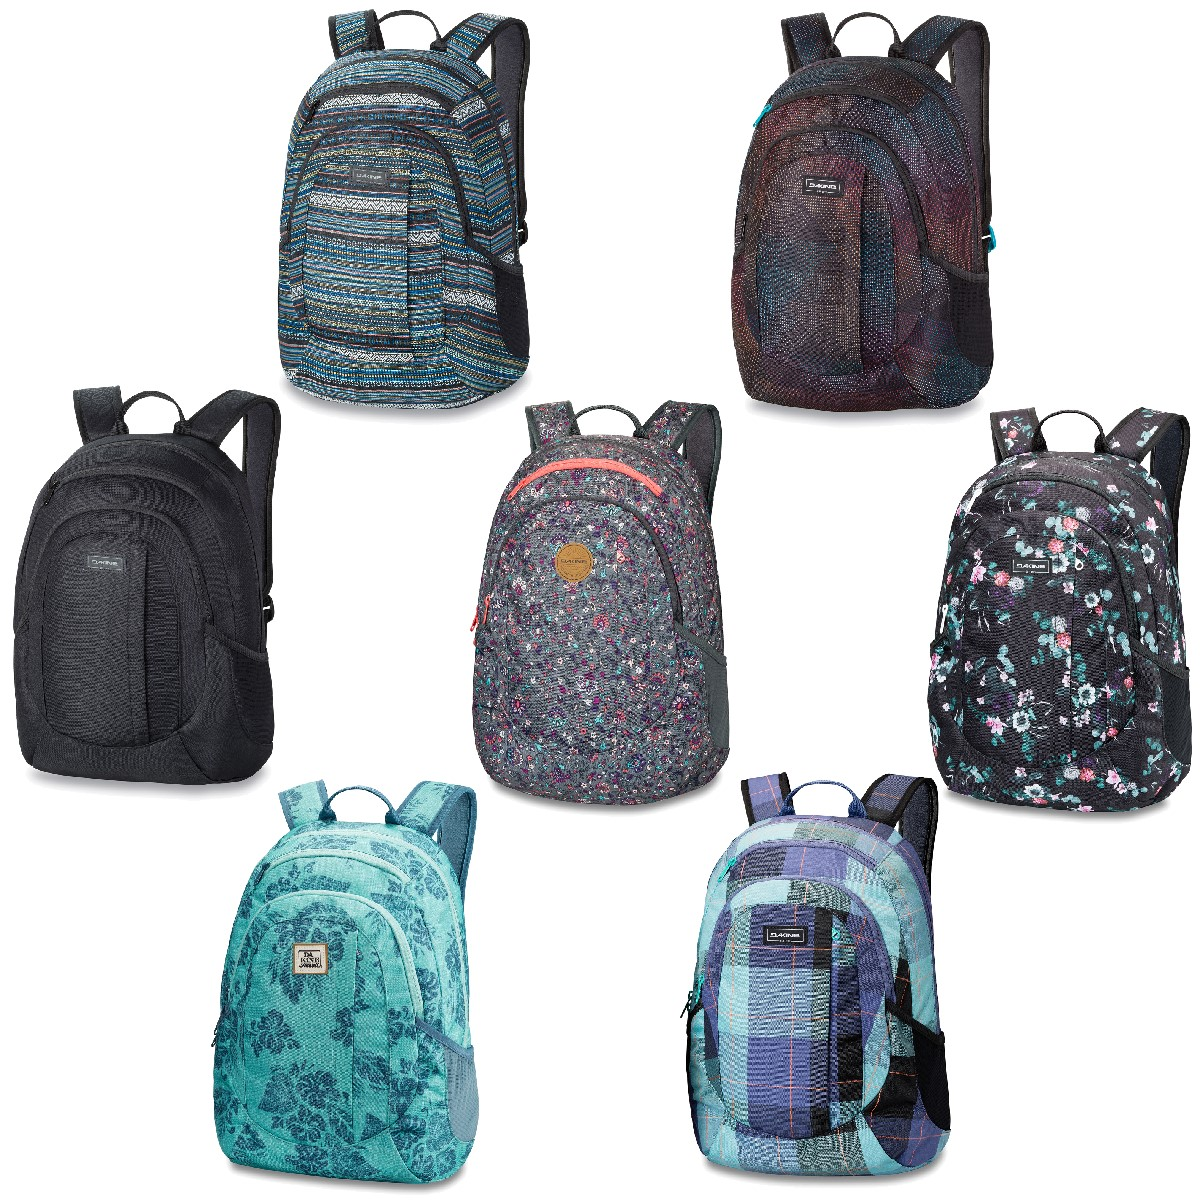 d0b06f5cd03d6 Dakine Rucksack Girls Garden Pack 20 Liter Backpack Schulrucksack ...